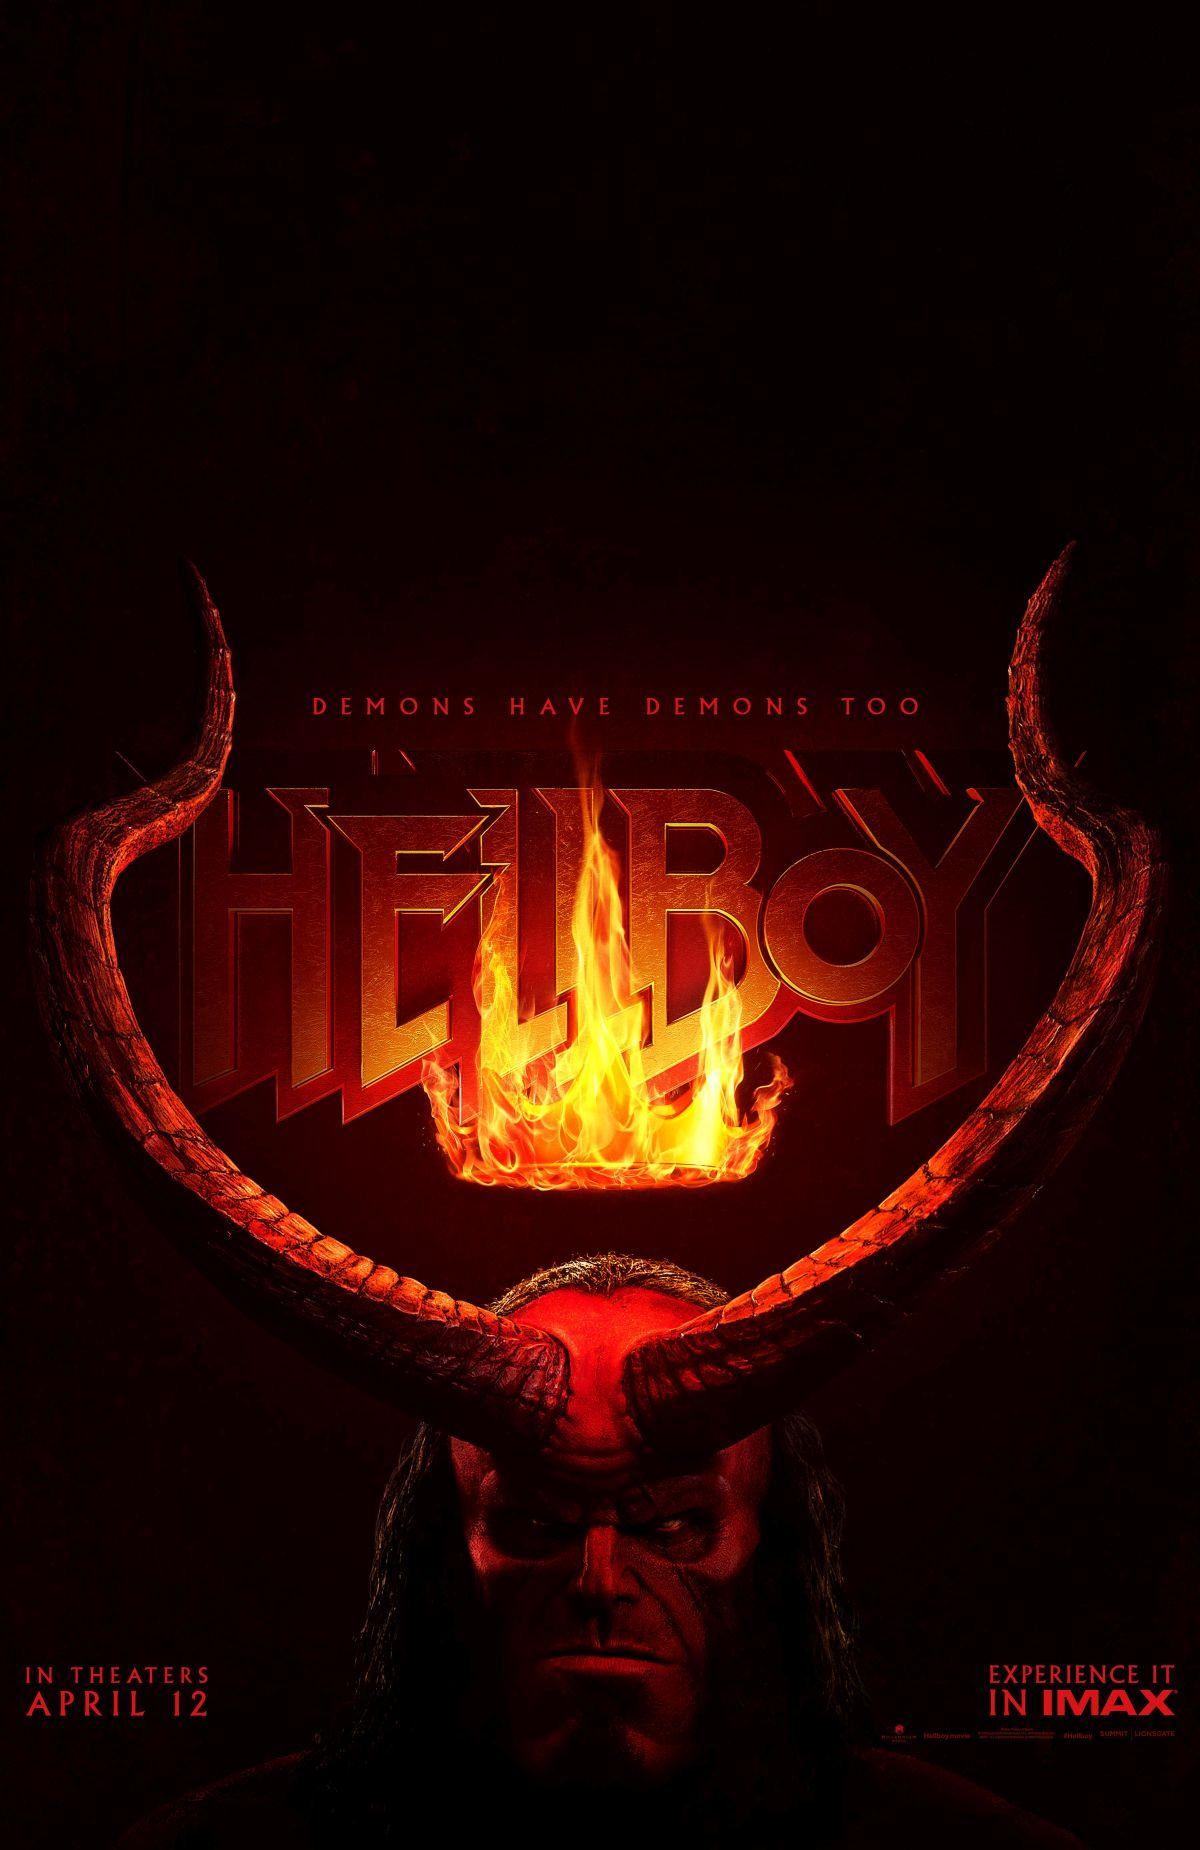 Hellboy Poster Trailer